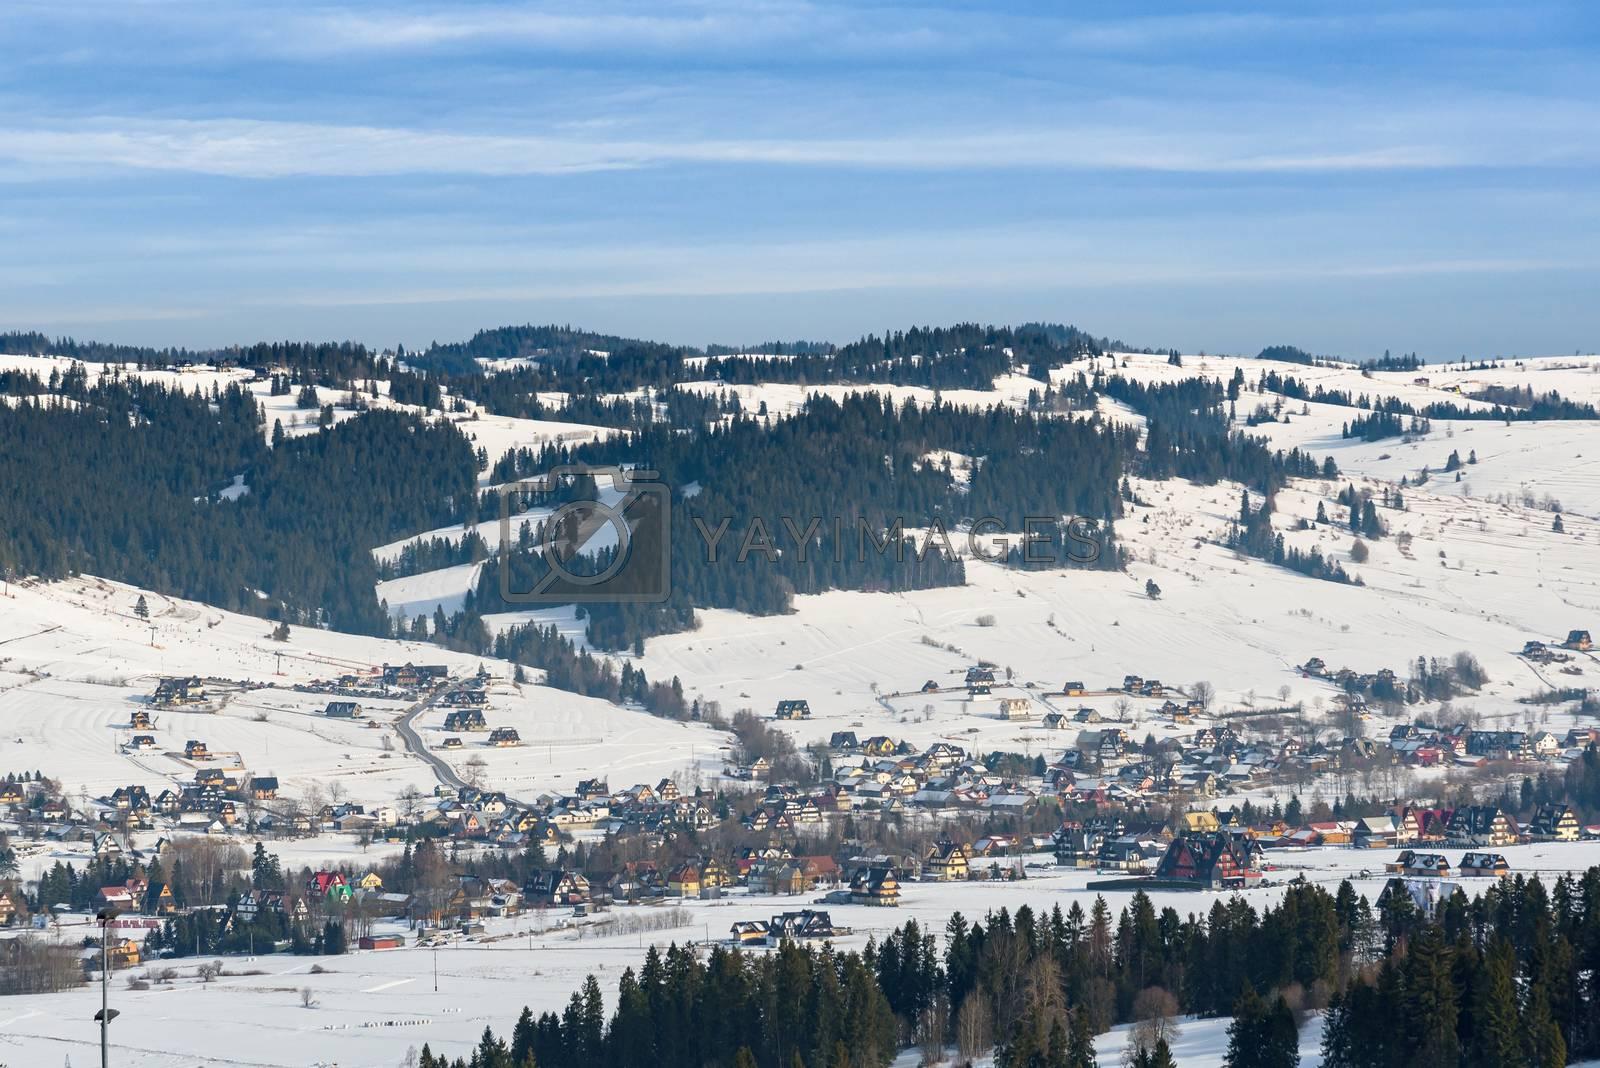 Aerial view of Bialka Tatrzanska village, famous ski resort in polish Tatra Mountains